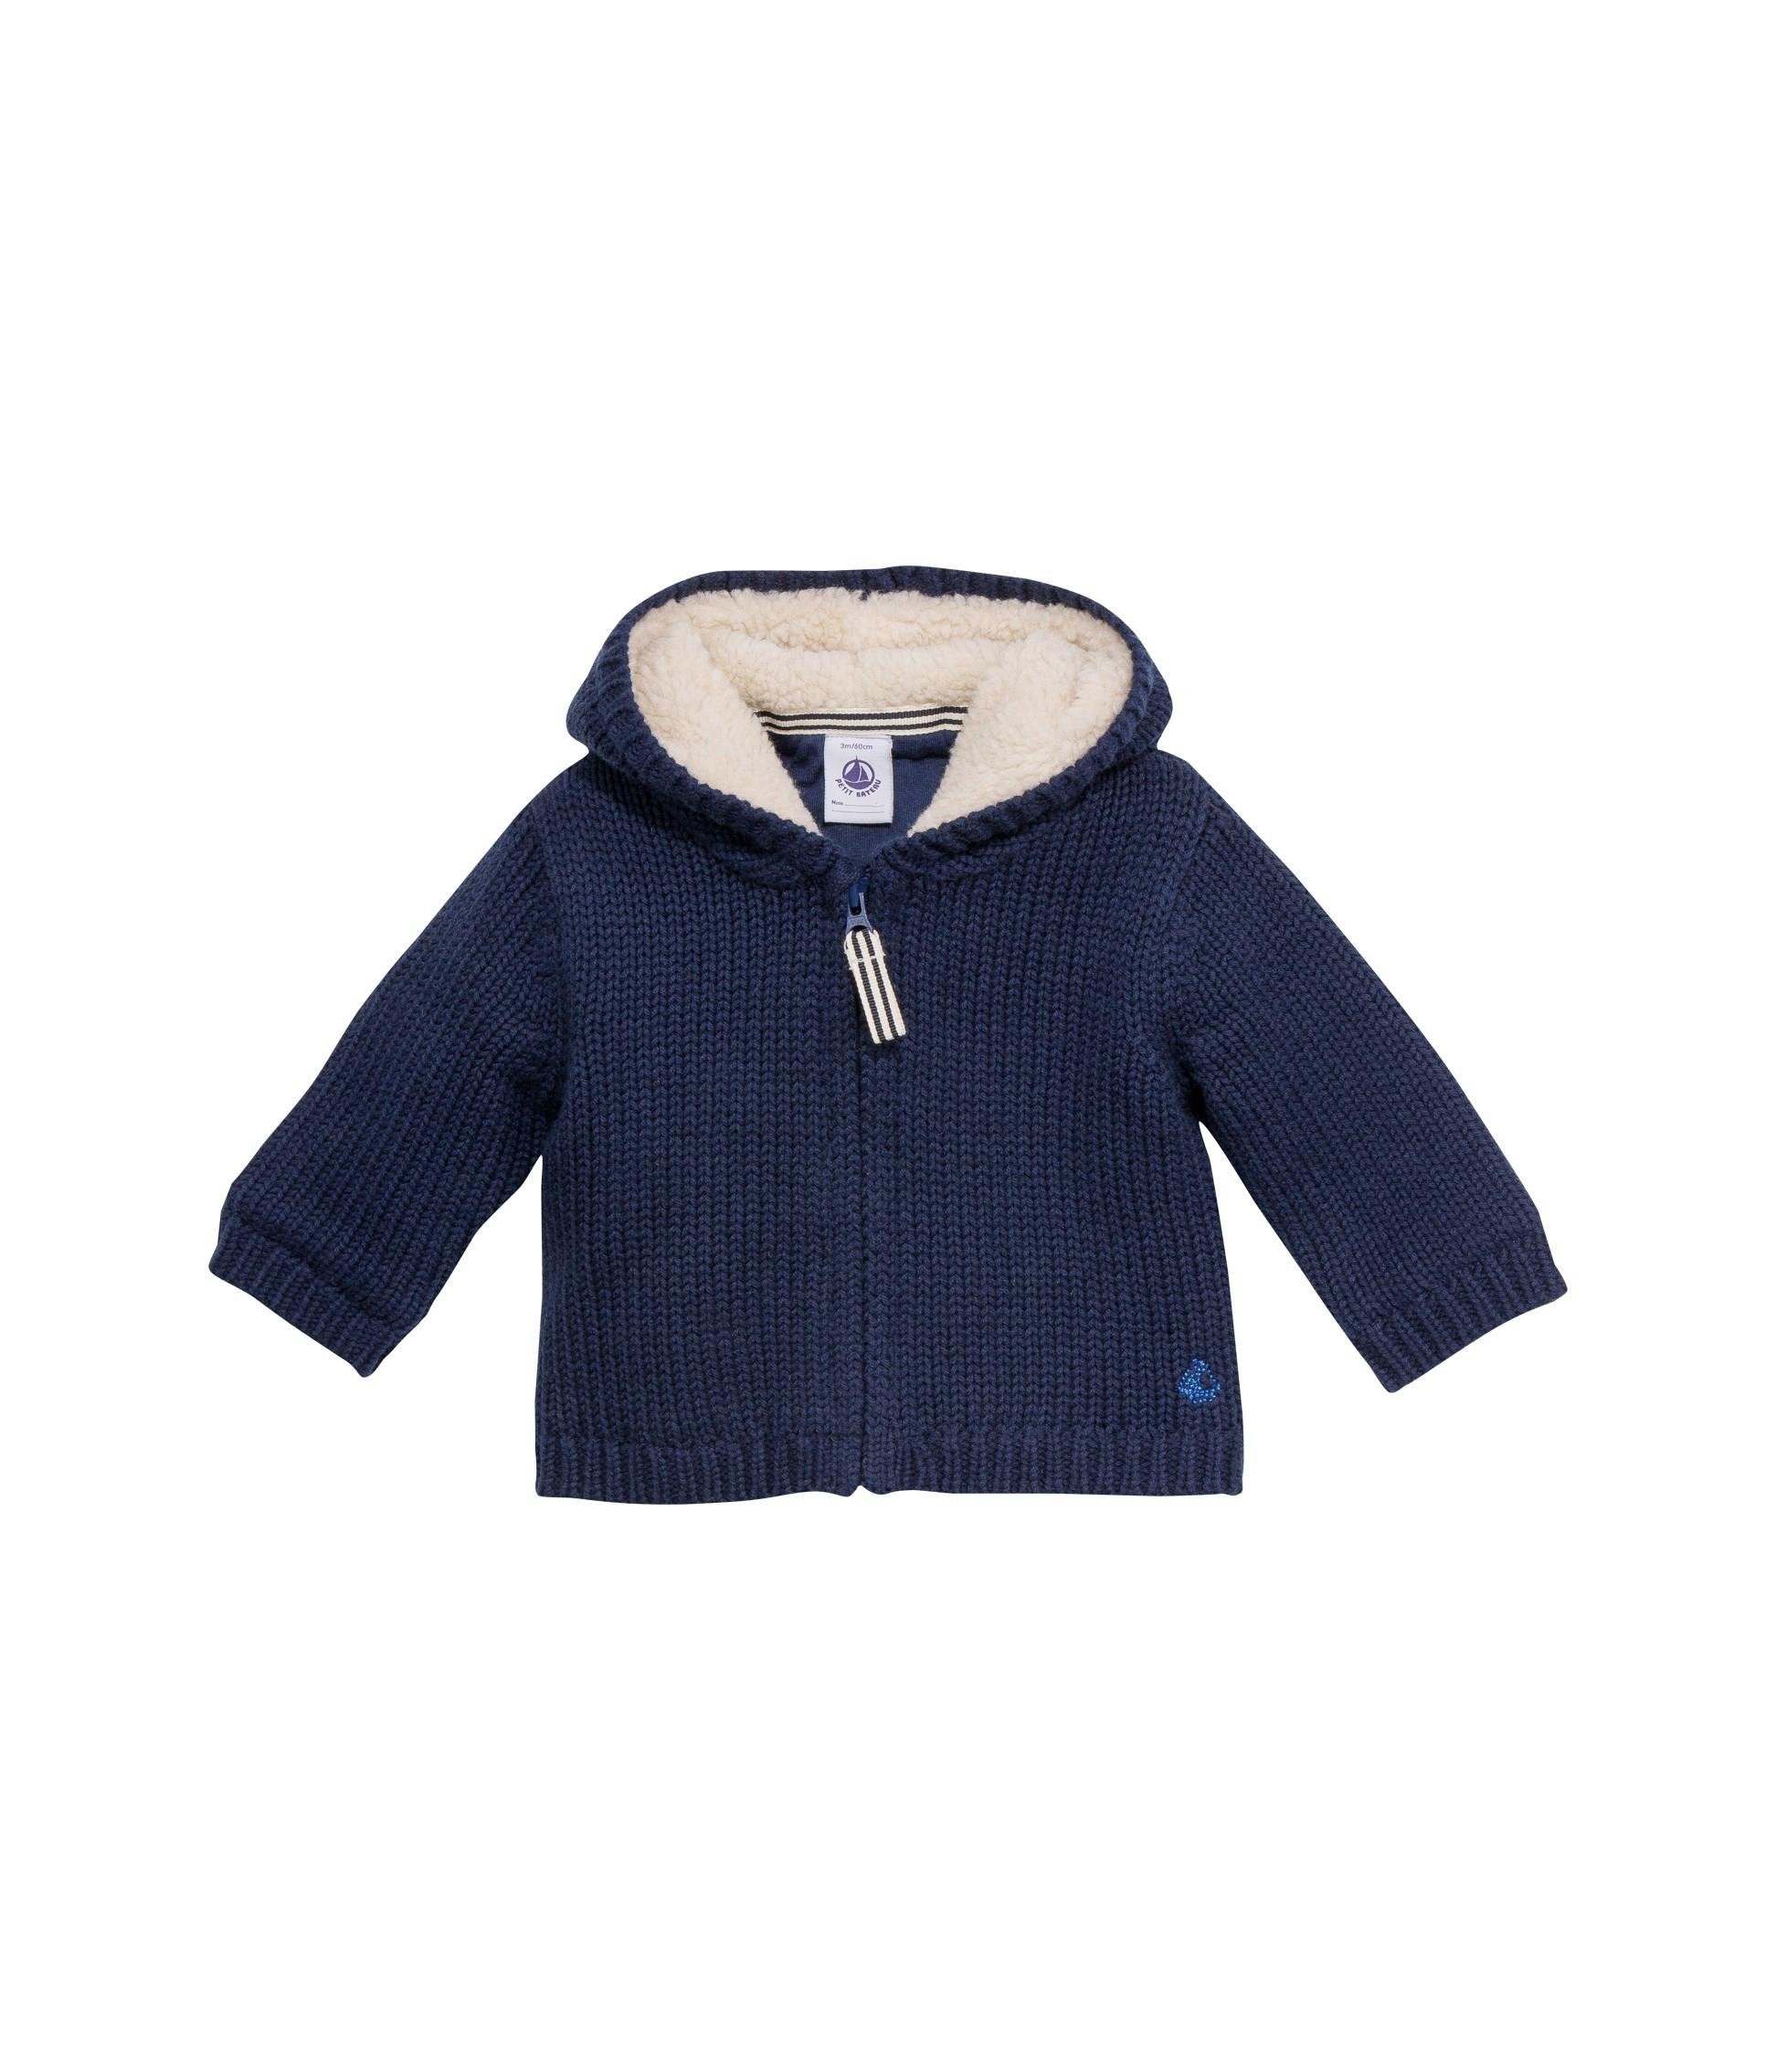 a5e9e01bf87 Μπουφάν με κουκούλα μονόχρωμο από μαλλί και βαμβάκι για μωρό αγόρι ...